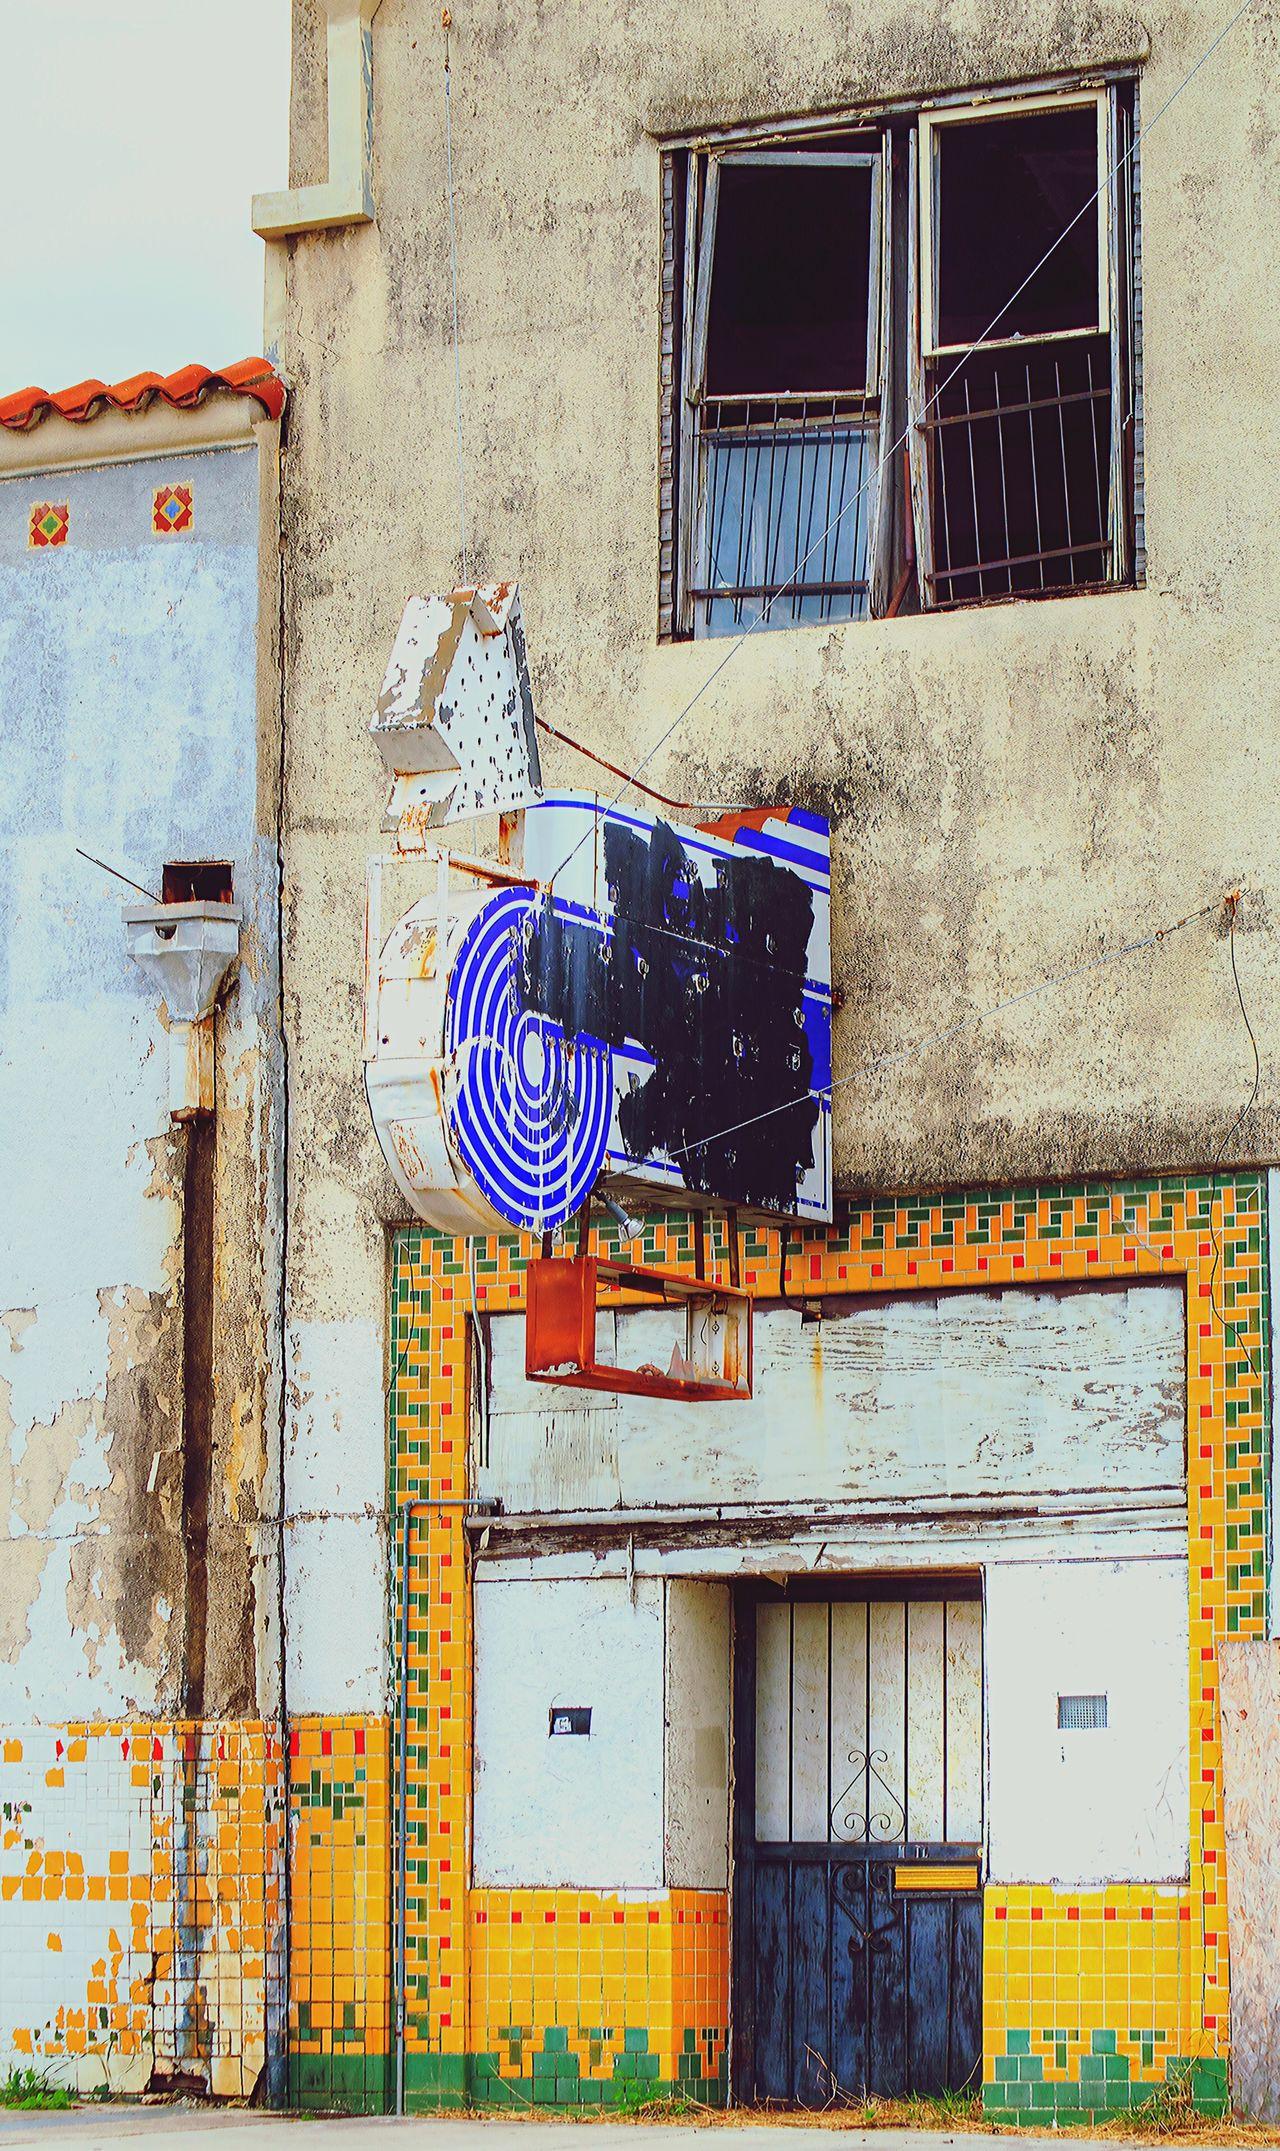 The Architect - 2016 EyeEm Awards EyeEmGalley Urban Photography Streetphotography San Antonio